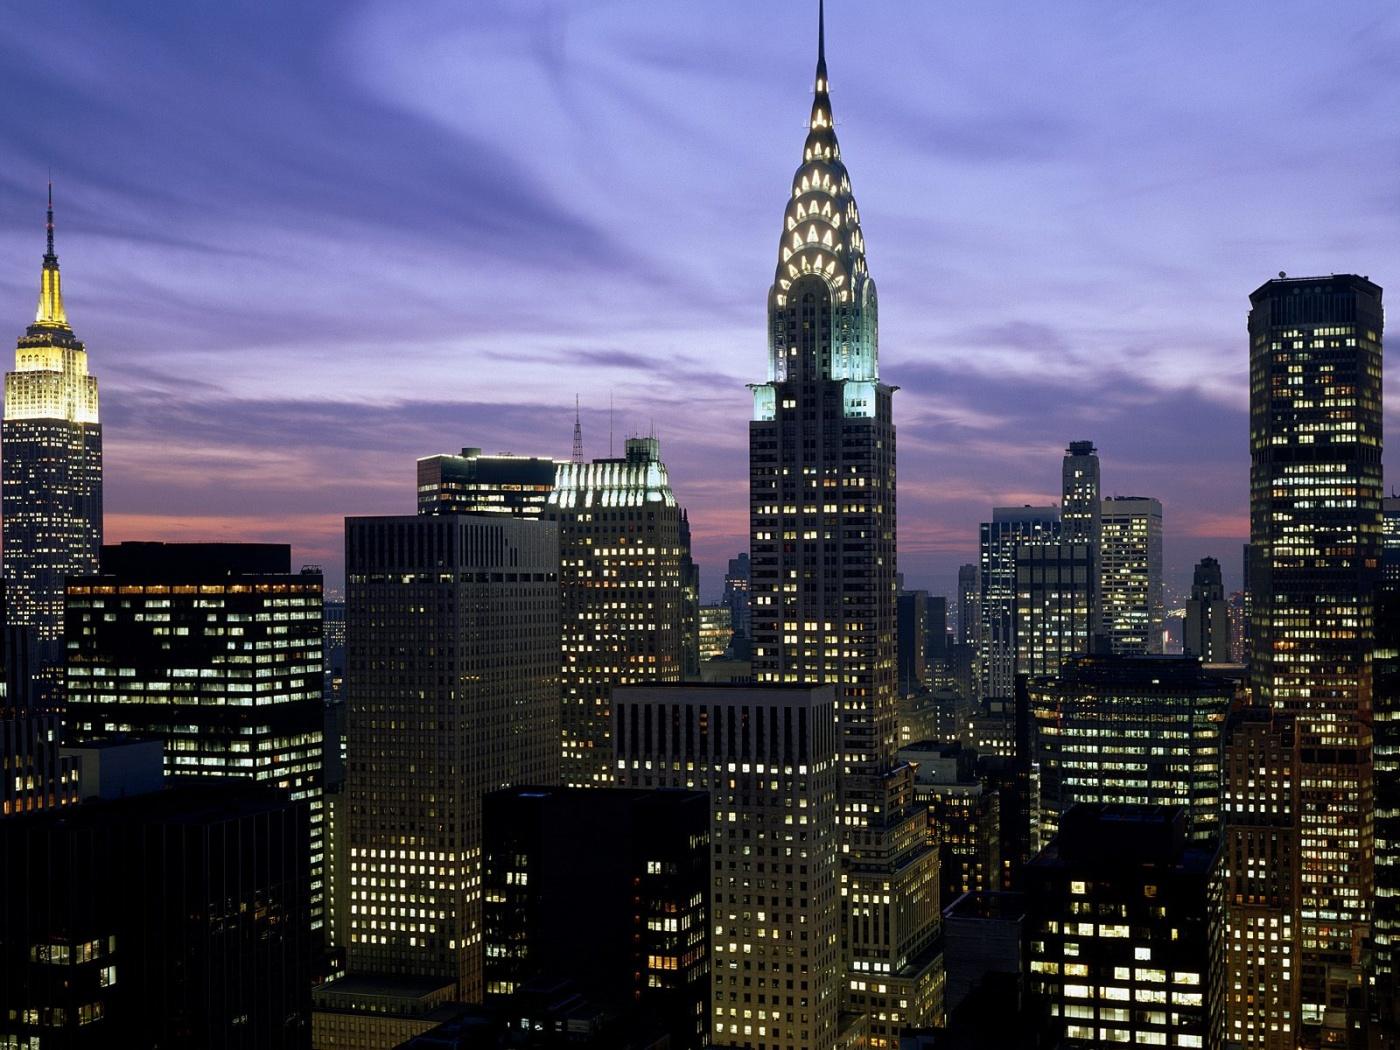 ... x 1200. Normal 5:4 resolutions: 1280 x 1024 Original Link. Download New York City Evening ...